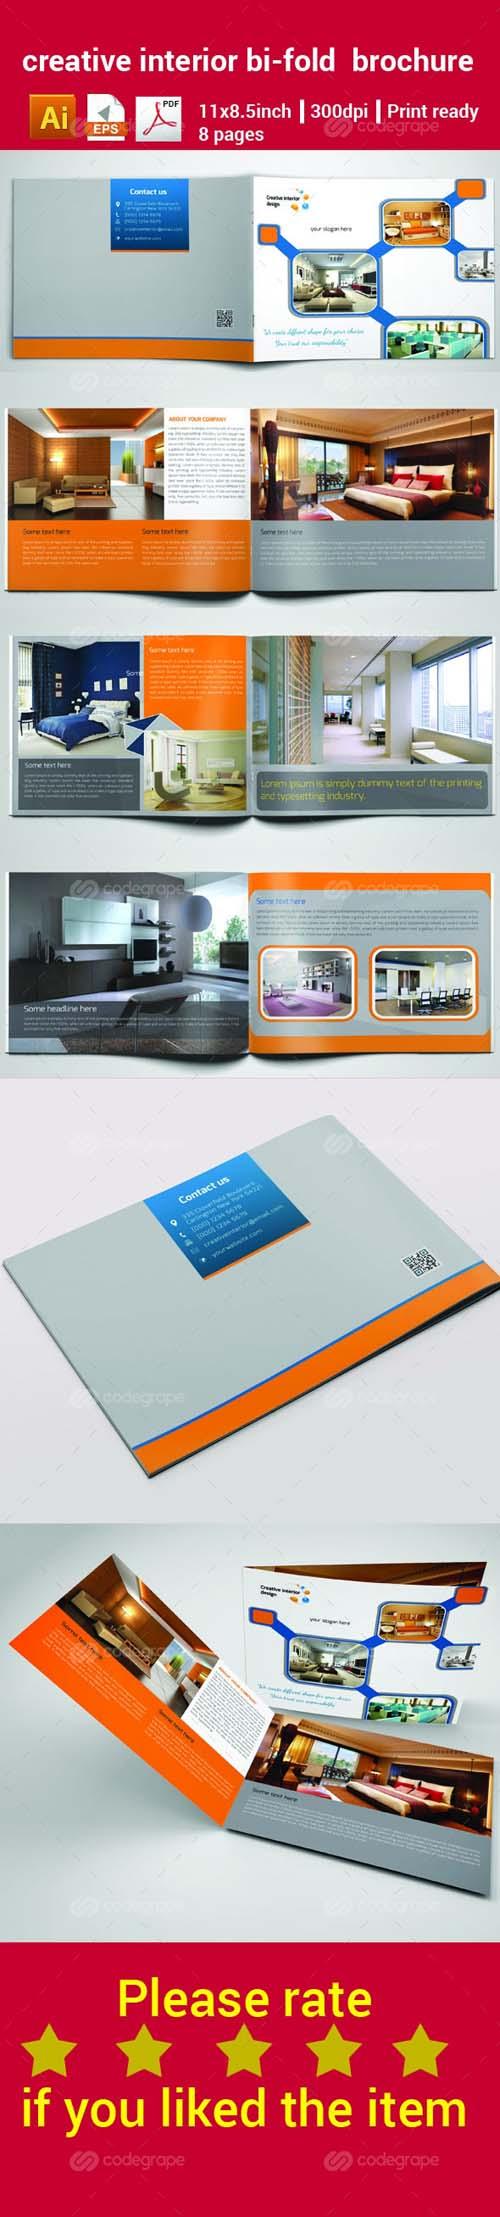 Creative Interior Bi-Fold Brochure